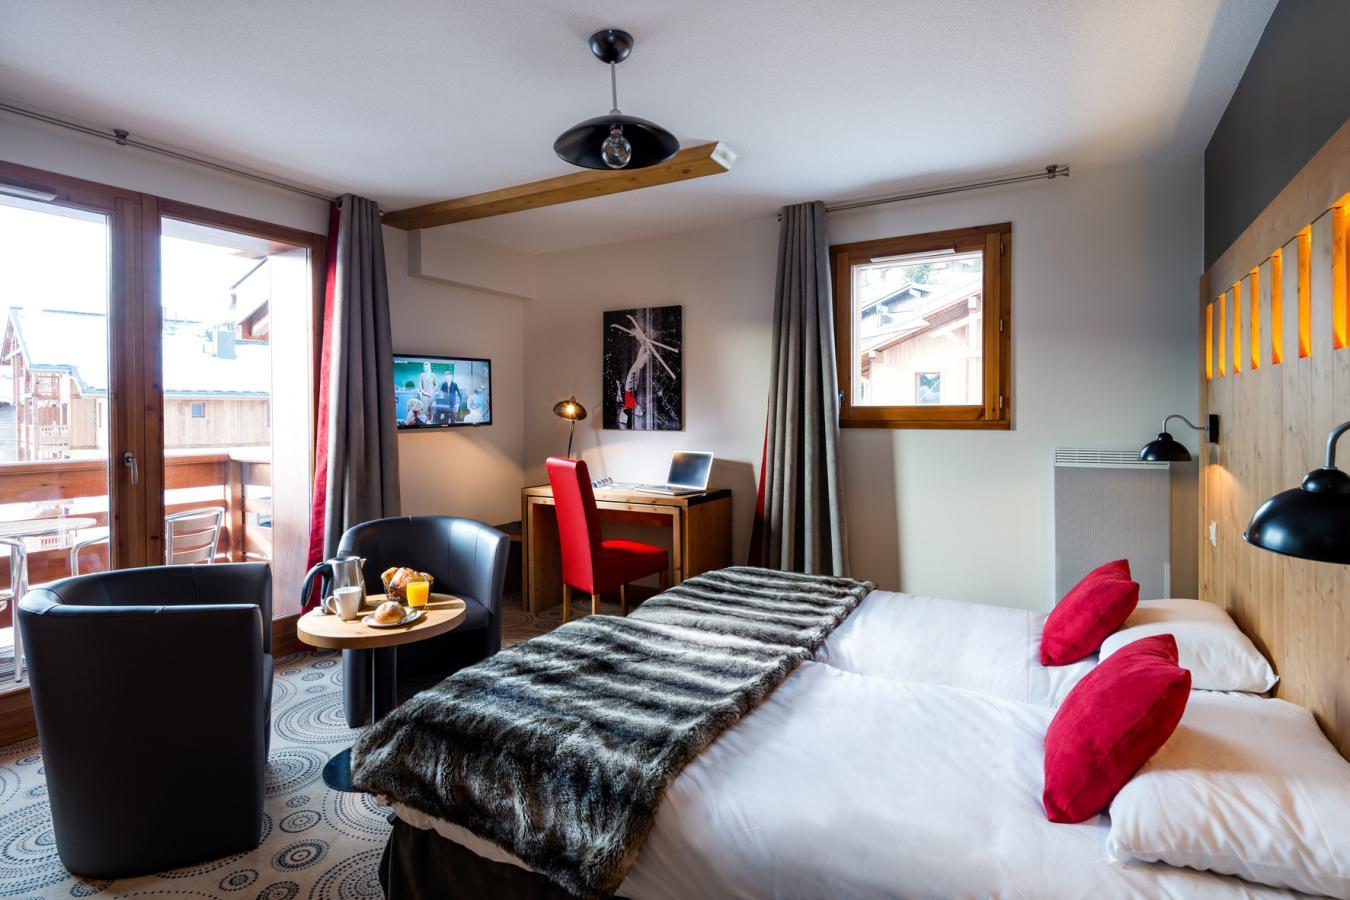 residence lagrange les chalets d emeraude les saisies location vacances ski les saisies ski